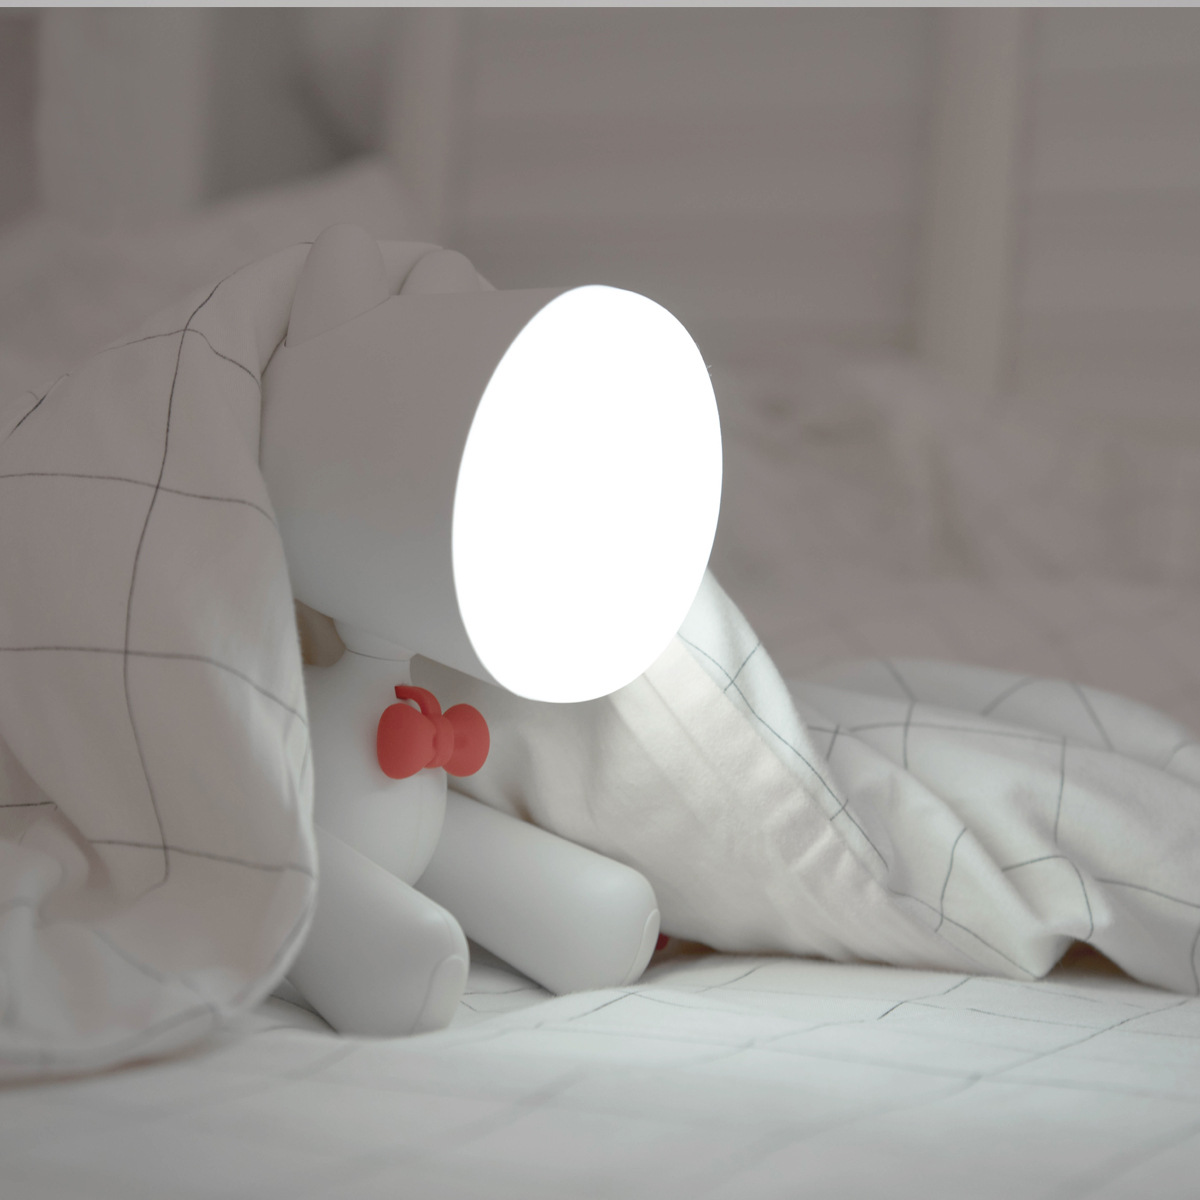 2020 Pup Led Night Lamp for Children 1200mAh Rechargable ELK Night Lights Adjust Brightness table lamp for Home in Bedroom